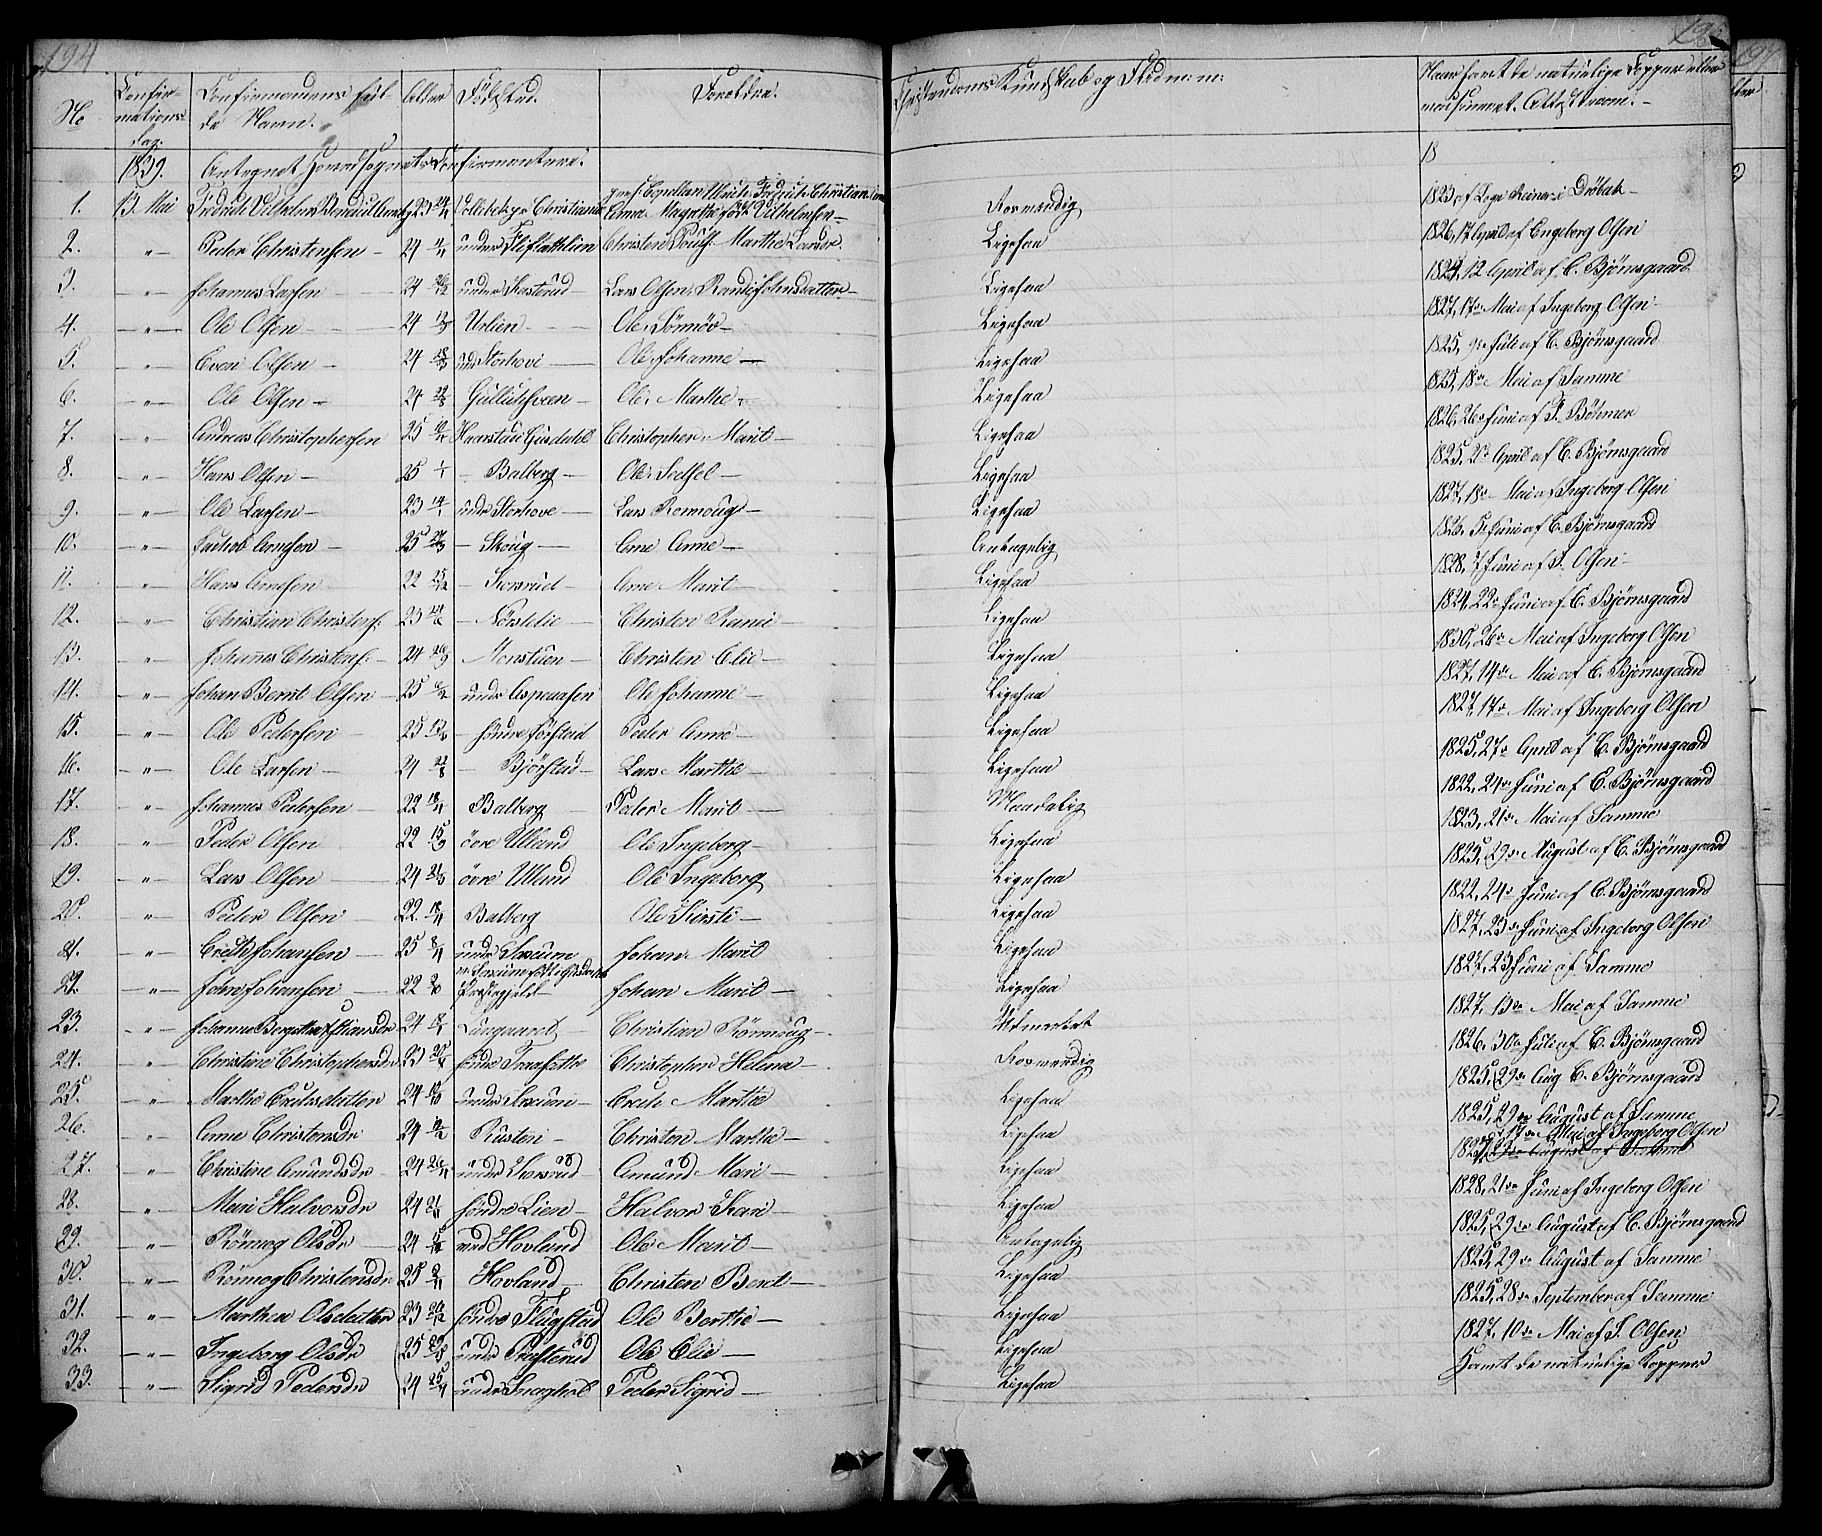 SAH, Fåberg prestekontor, Klokkerbok nr. 5, 1837-1864, s. 194-195